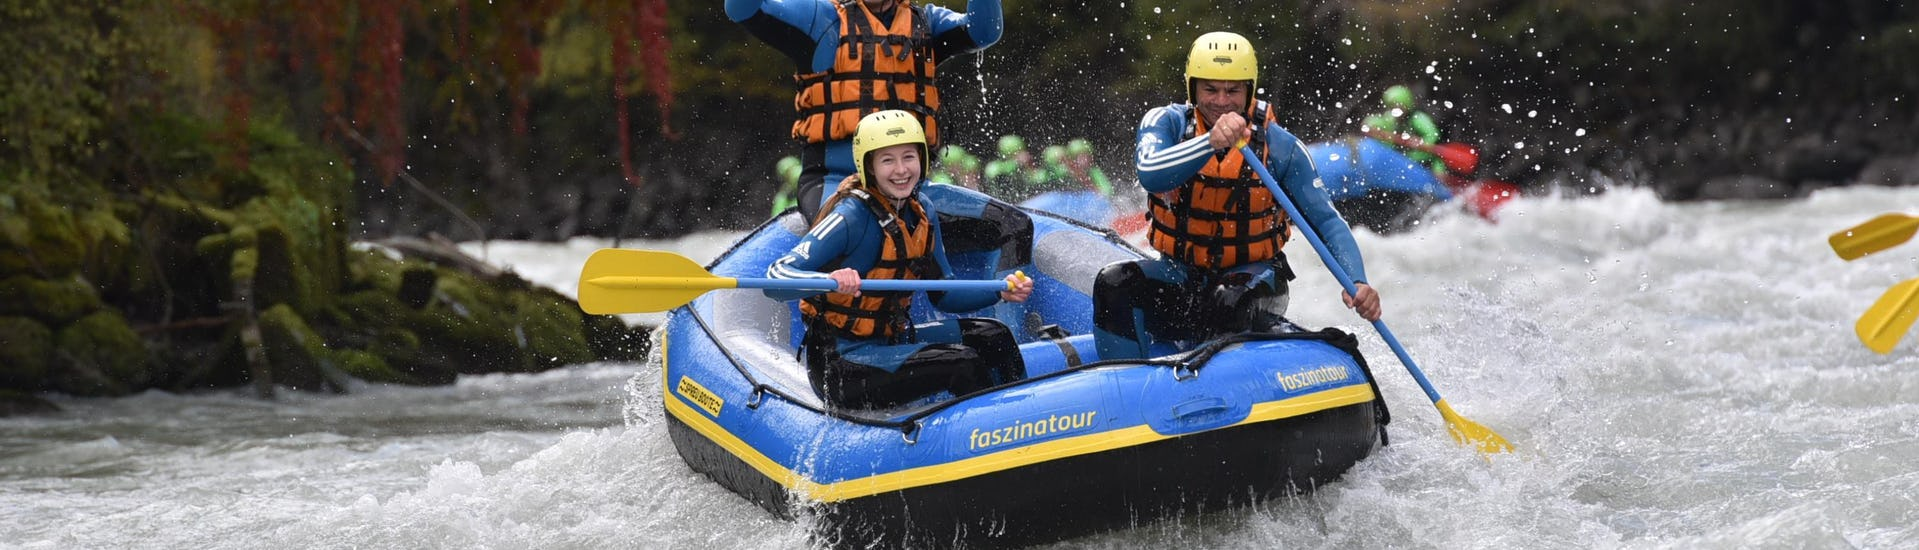 rafting-raft-for-explorers---imster-schlucht-faszinatour-hero